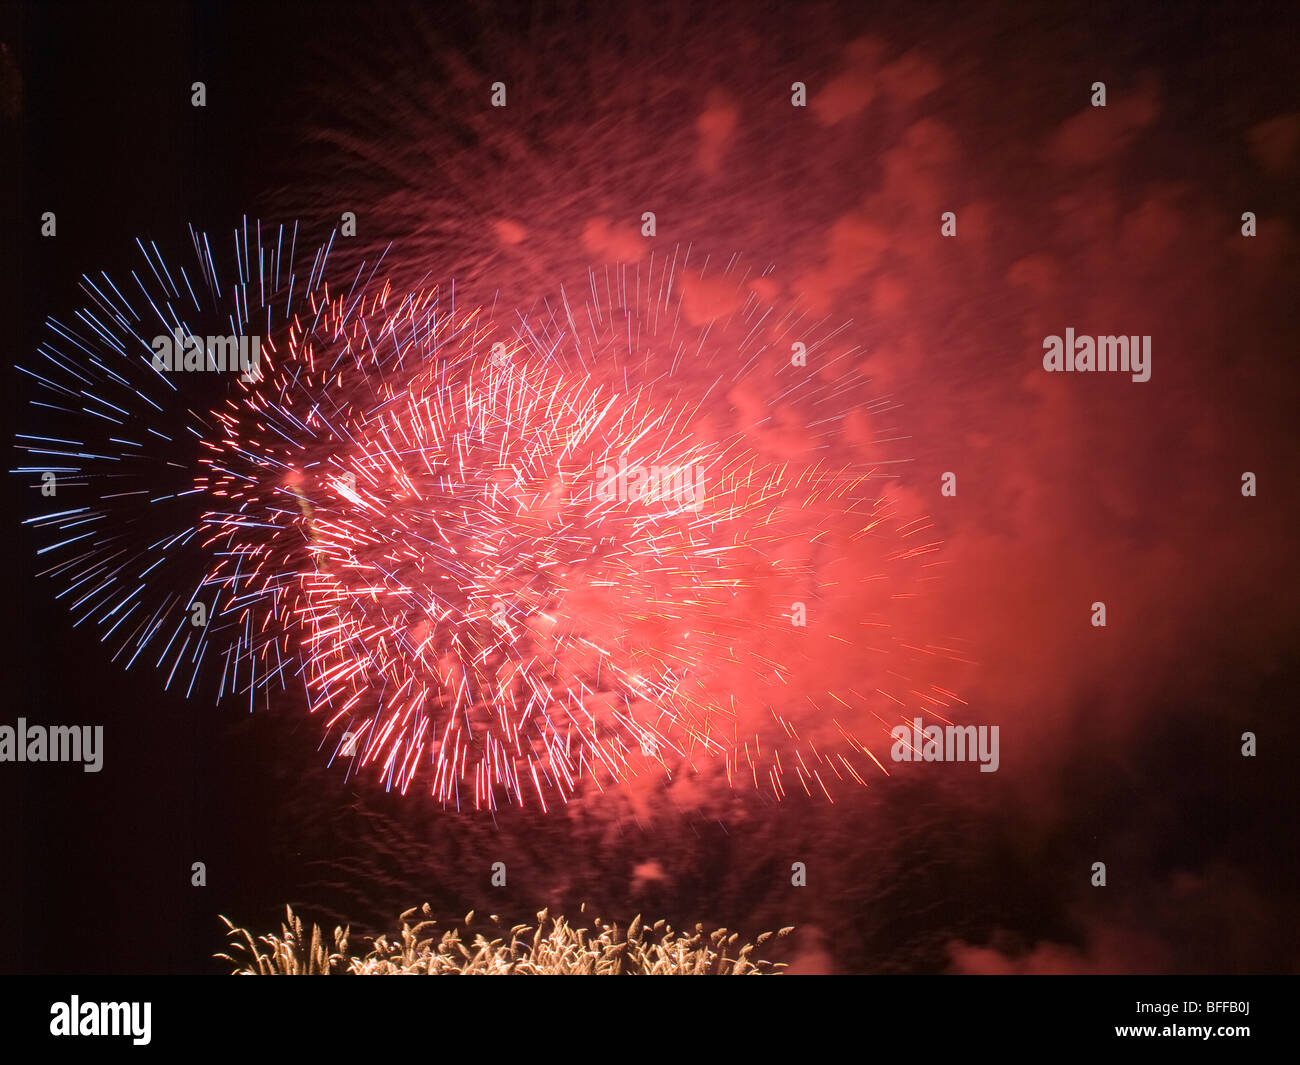 July 4th fireworks over Boston, Massachussetts, United States - Stock Image